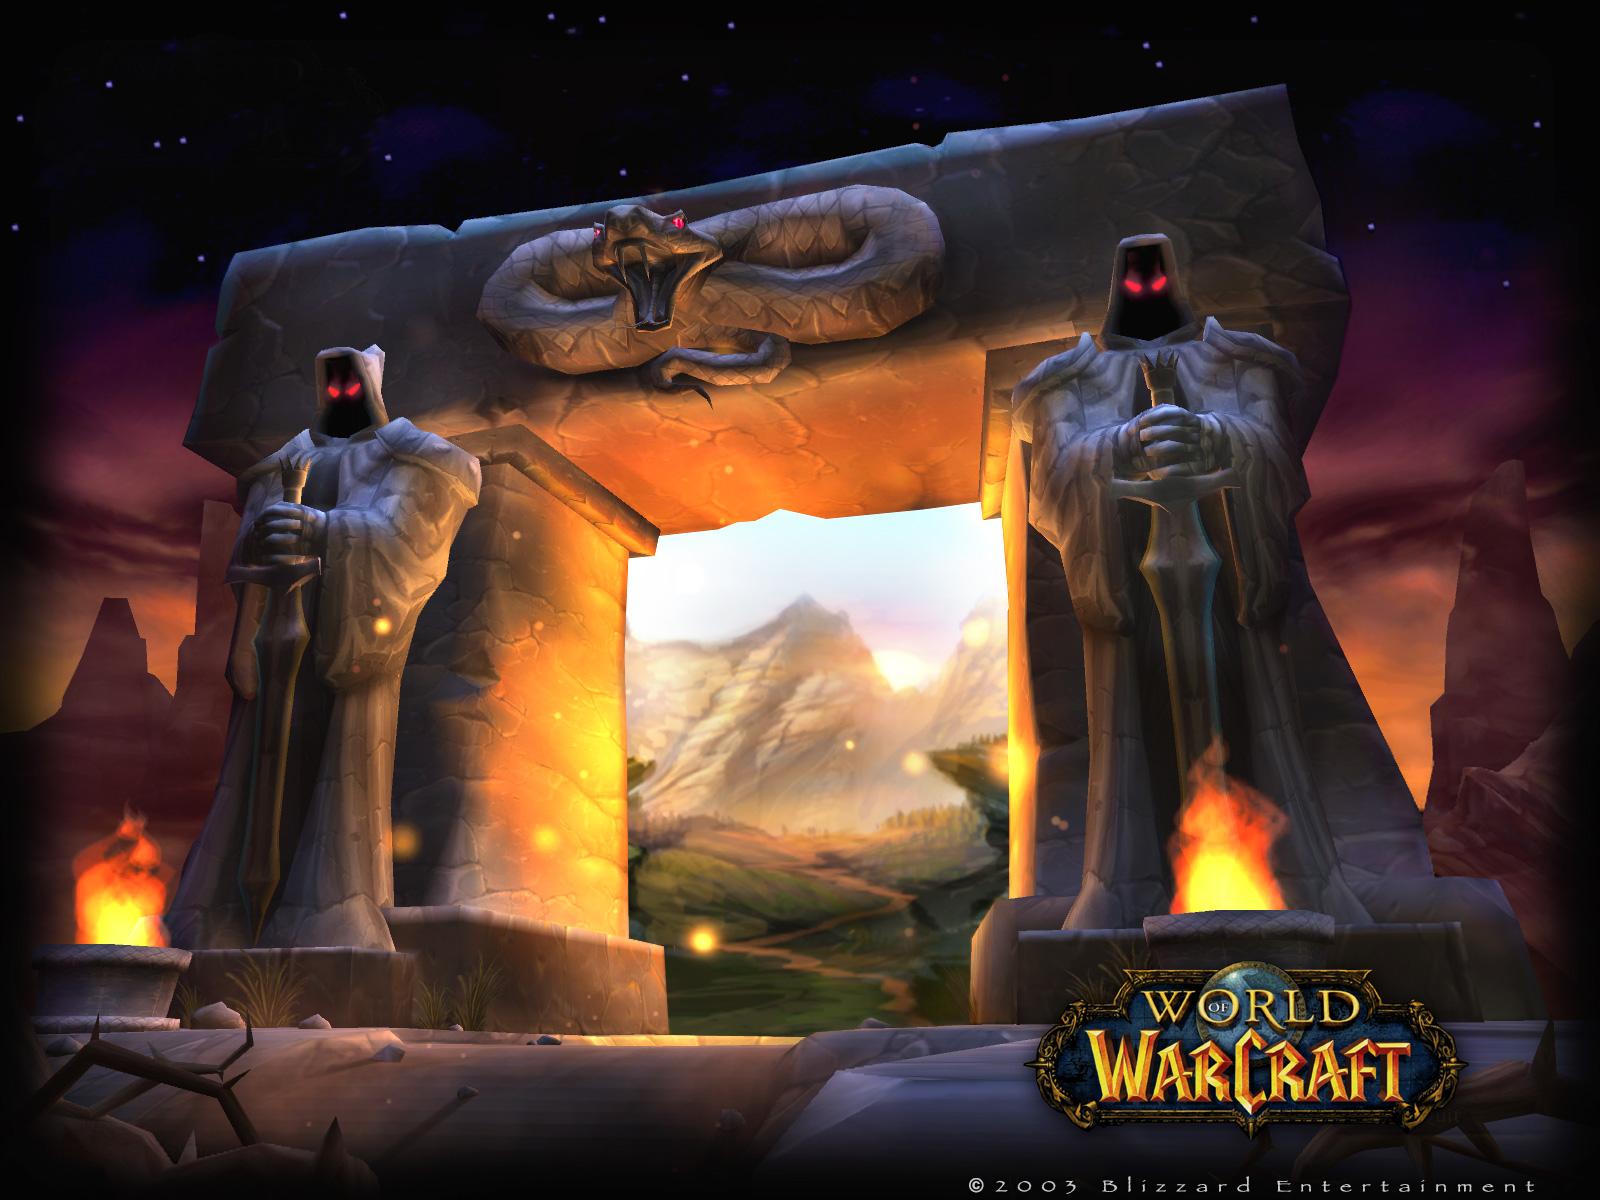 Bonewallpaper - Best desktop HD Wallpapers: World of ...